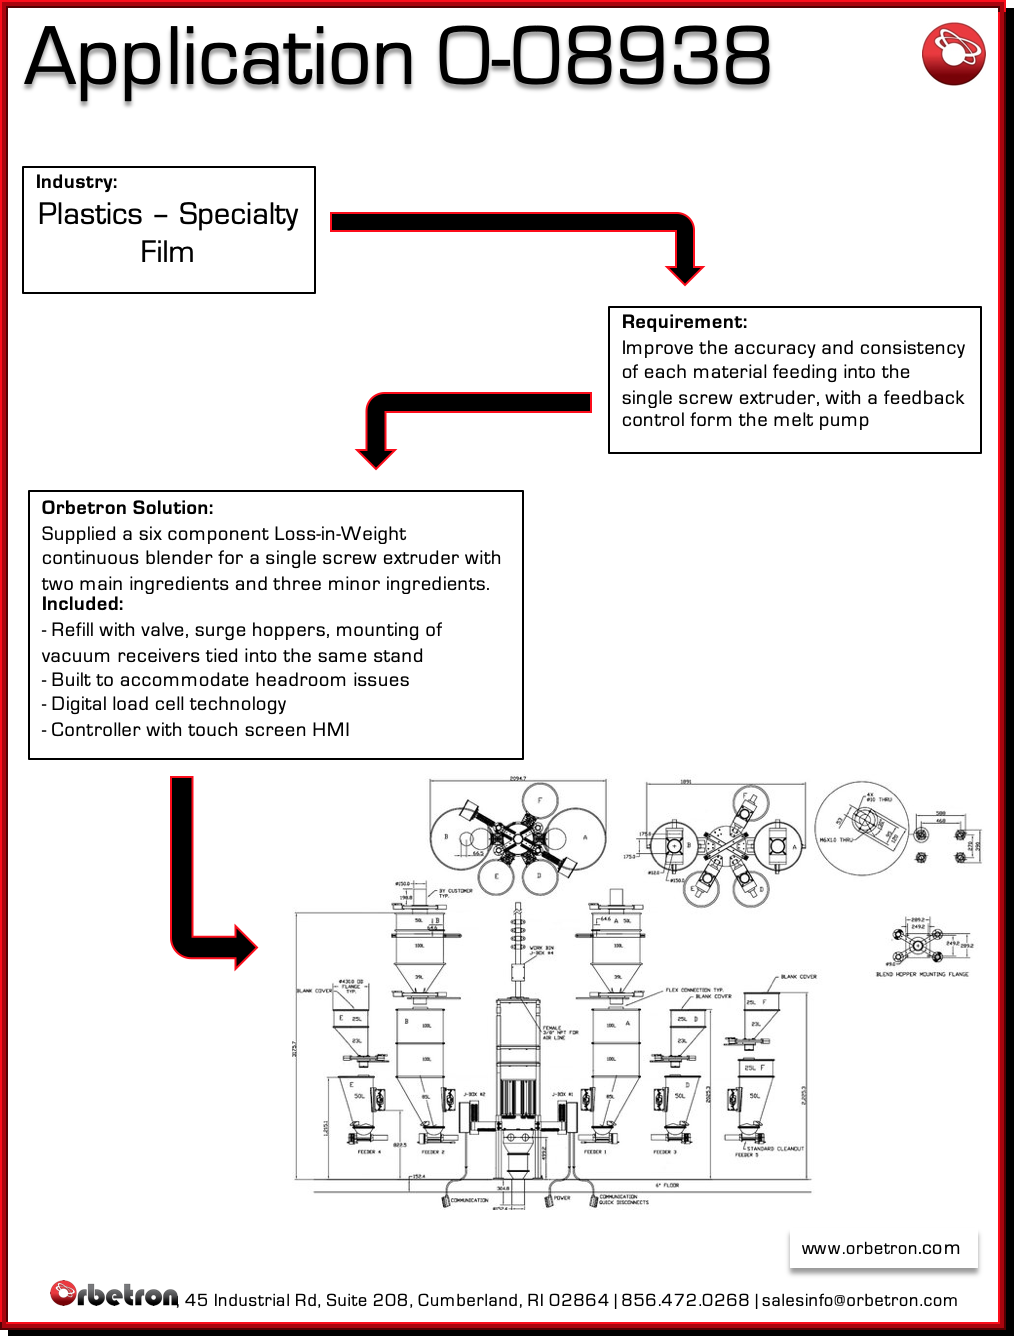 Plastics - Specialty Film - Application 0-08938